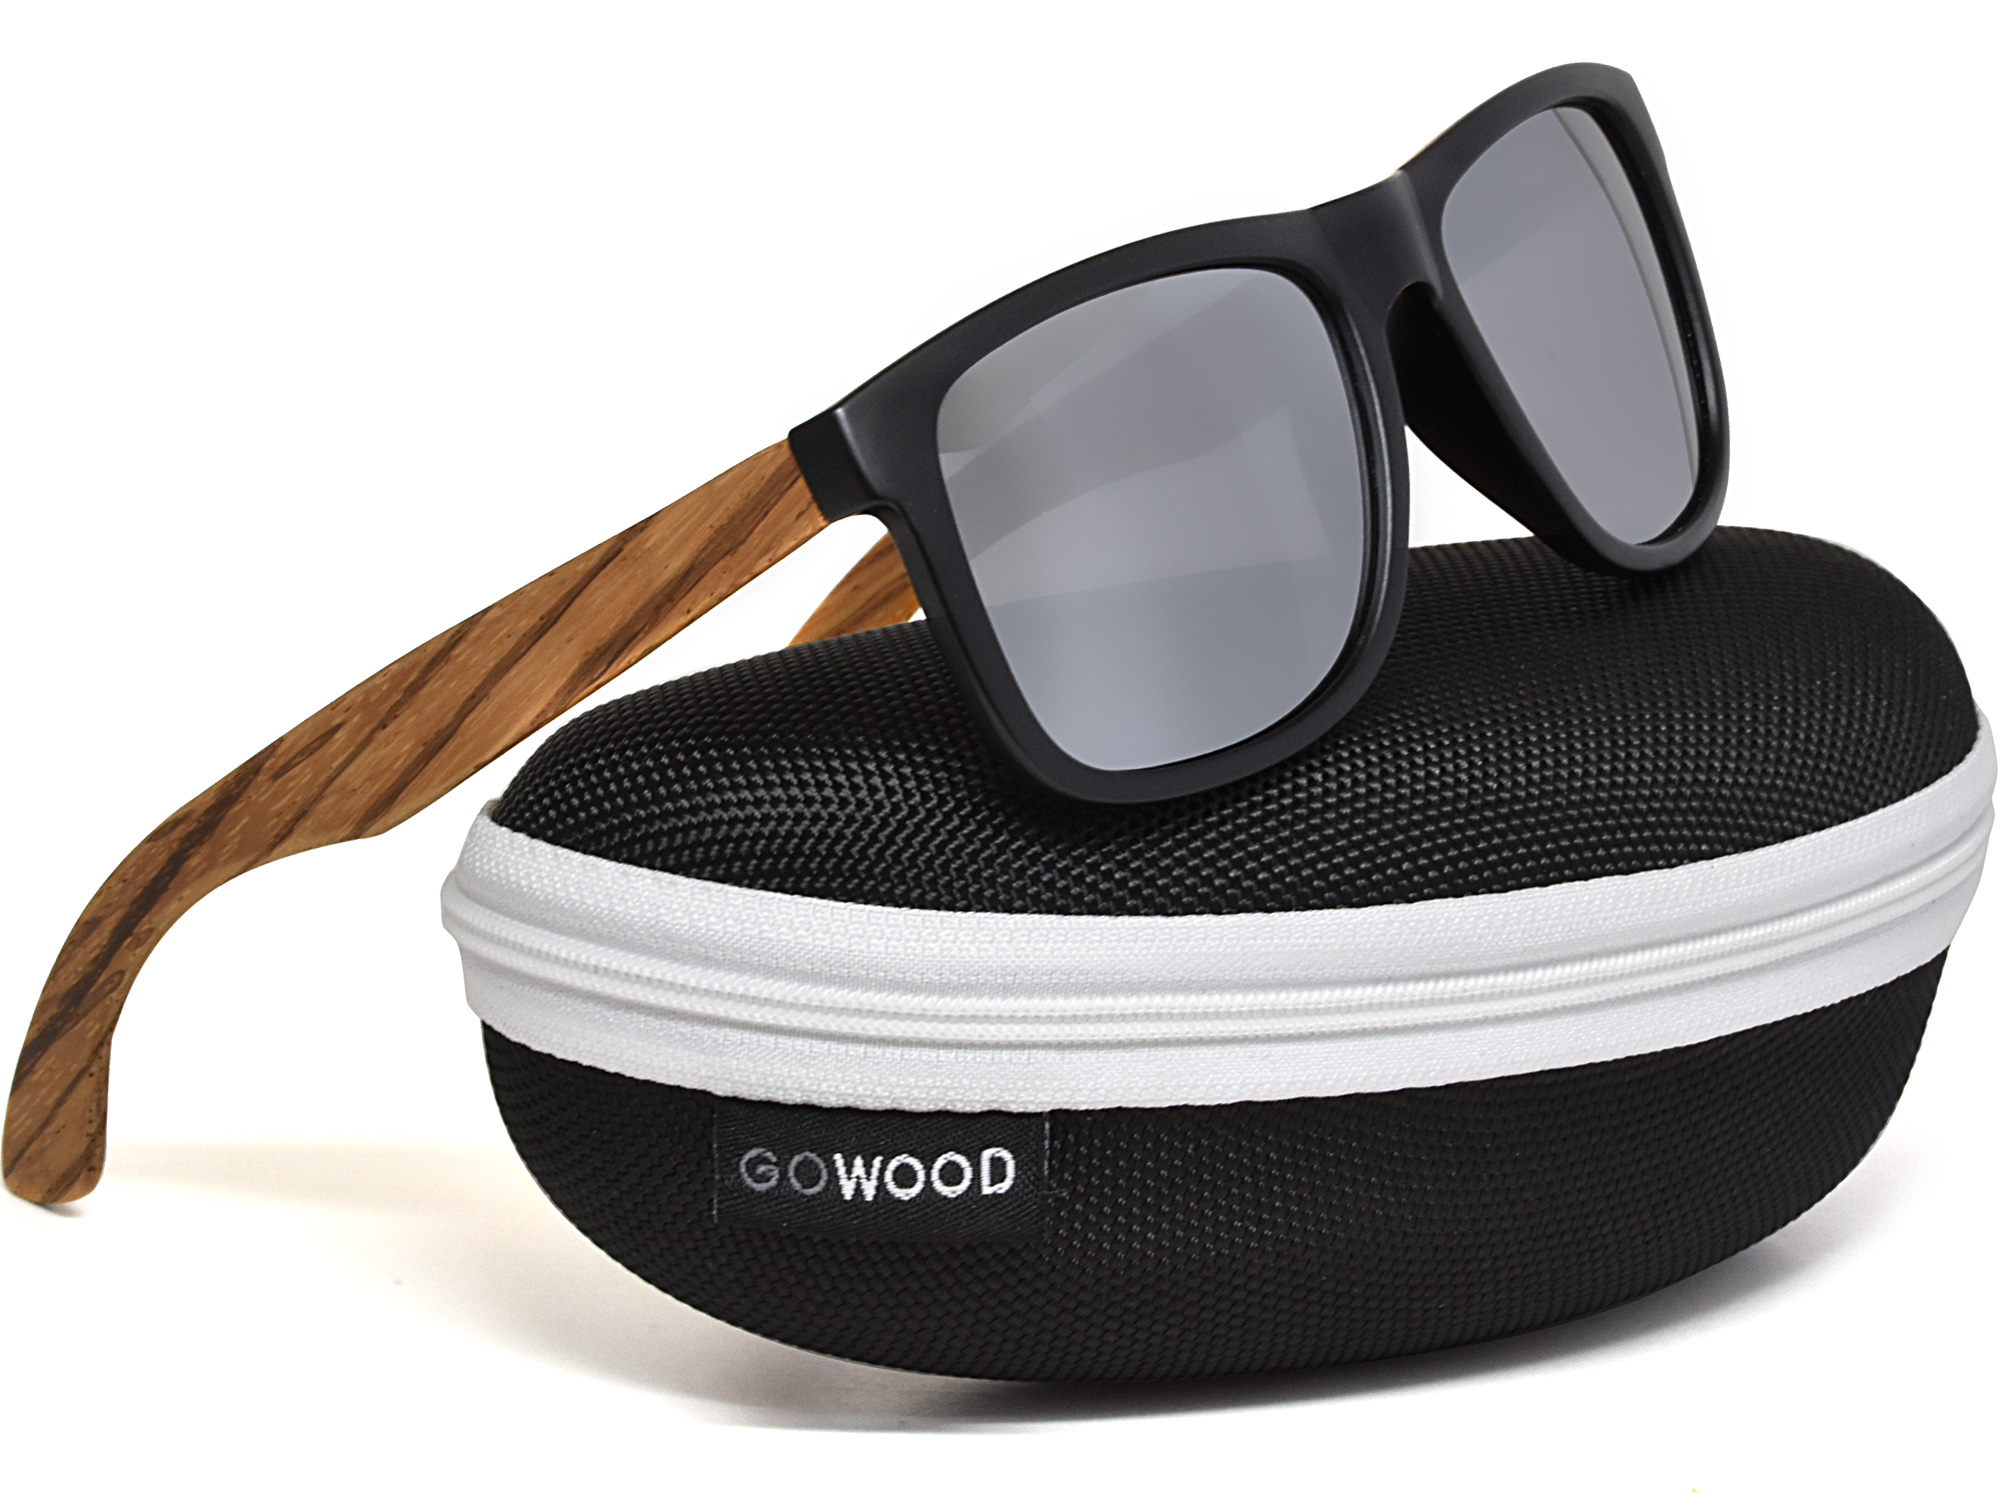 Square zebra wood sunglasses with silver mirrored polarized lenses in zipper case